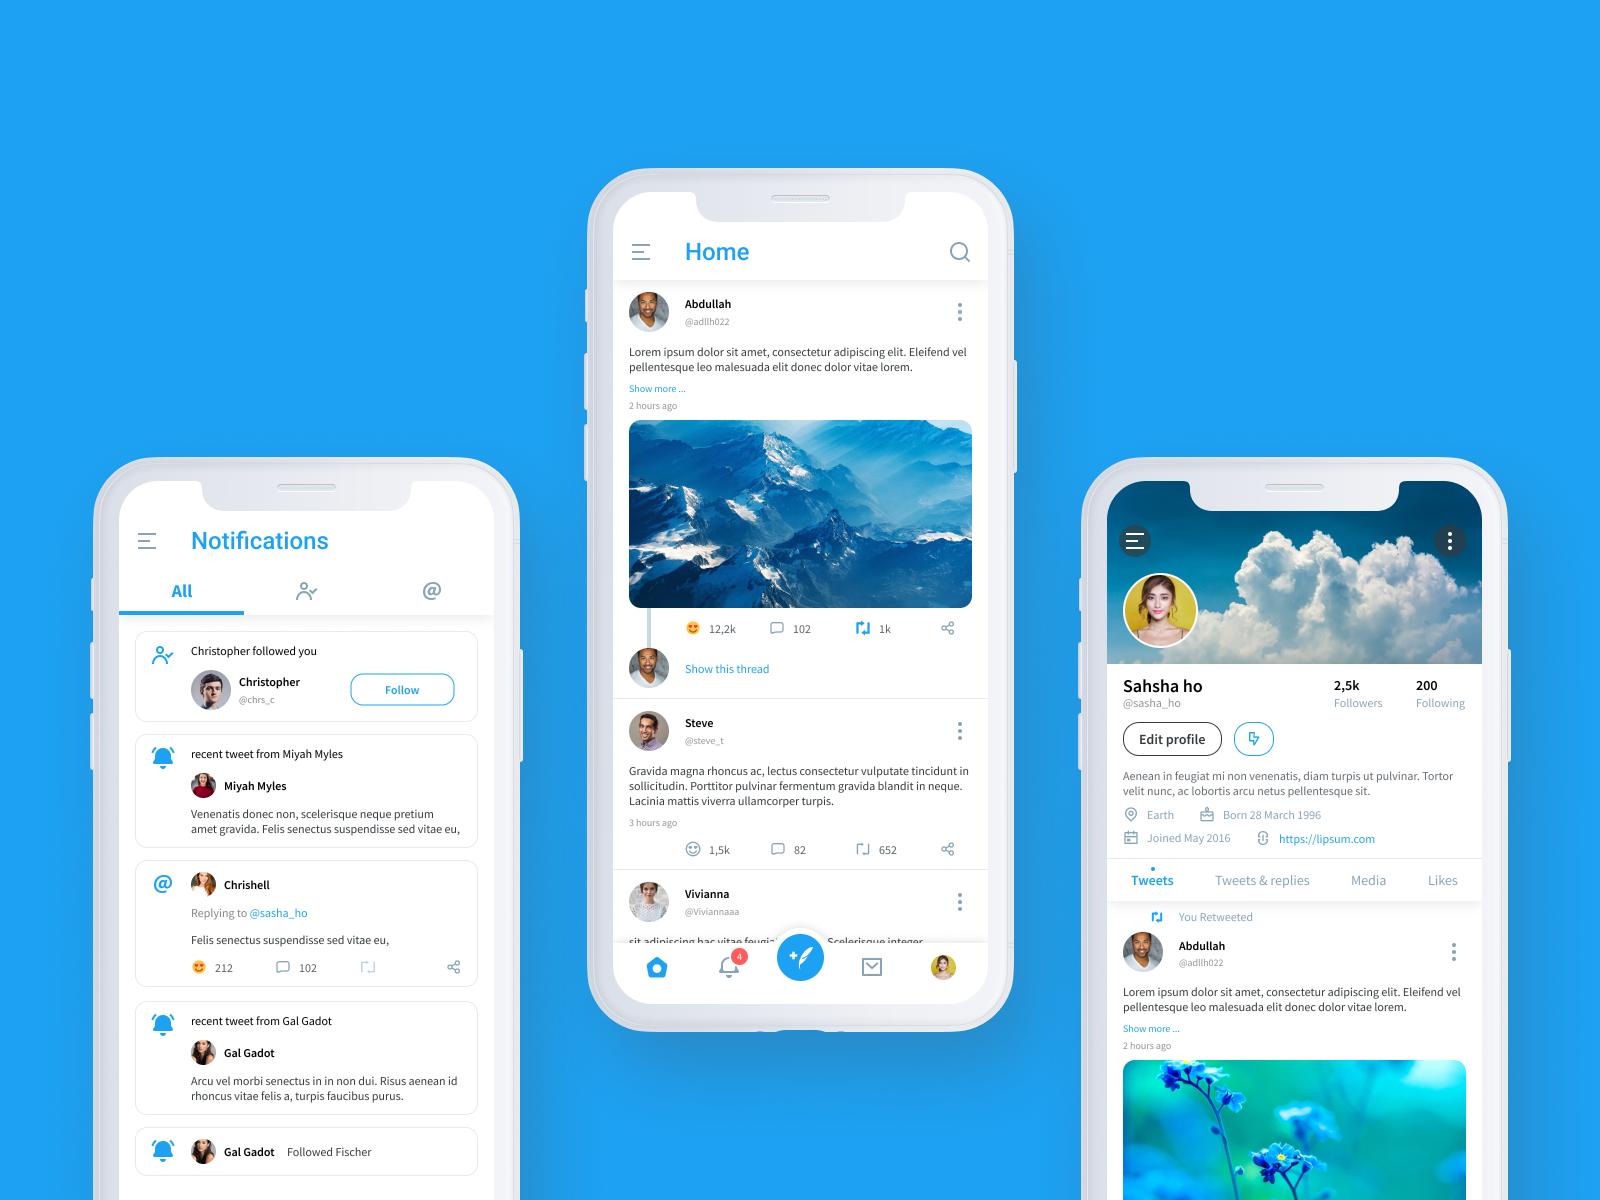 Twitter Redesign Challenge In 2020 Twitter Design Social App Design App Design